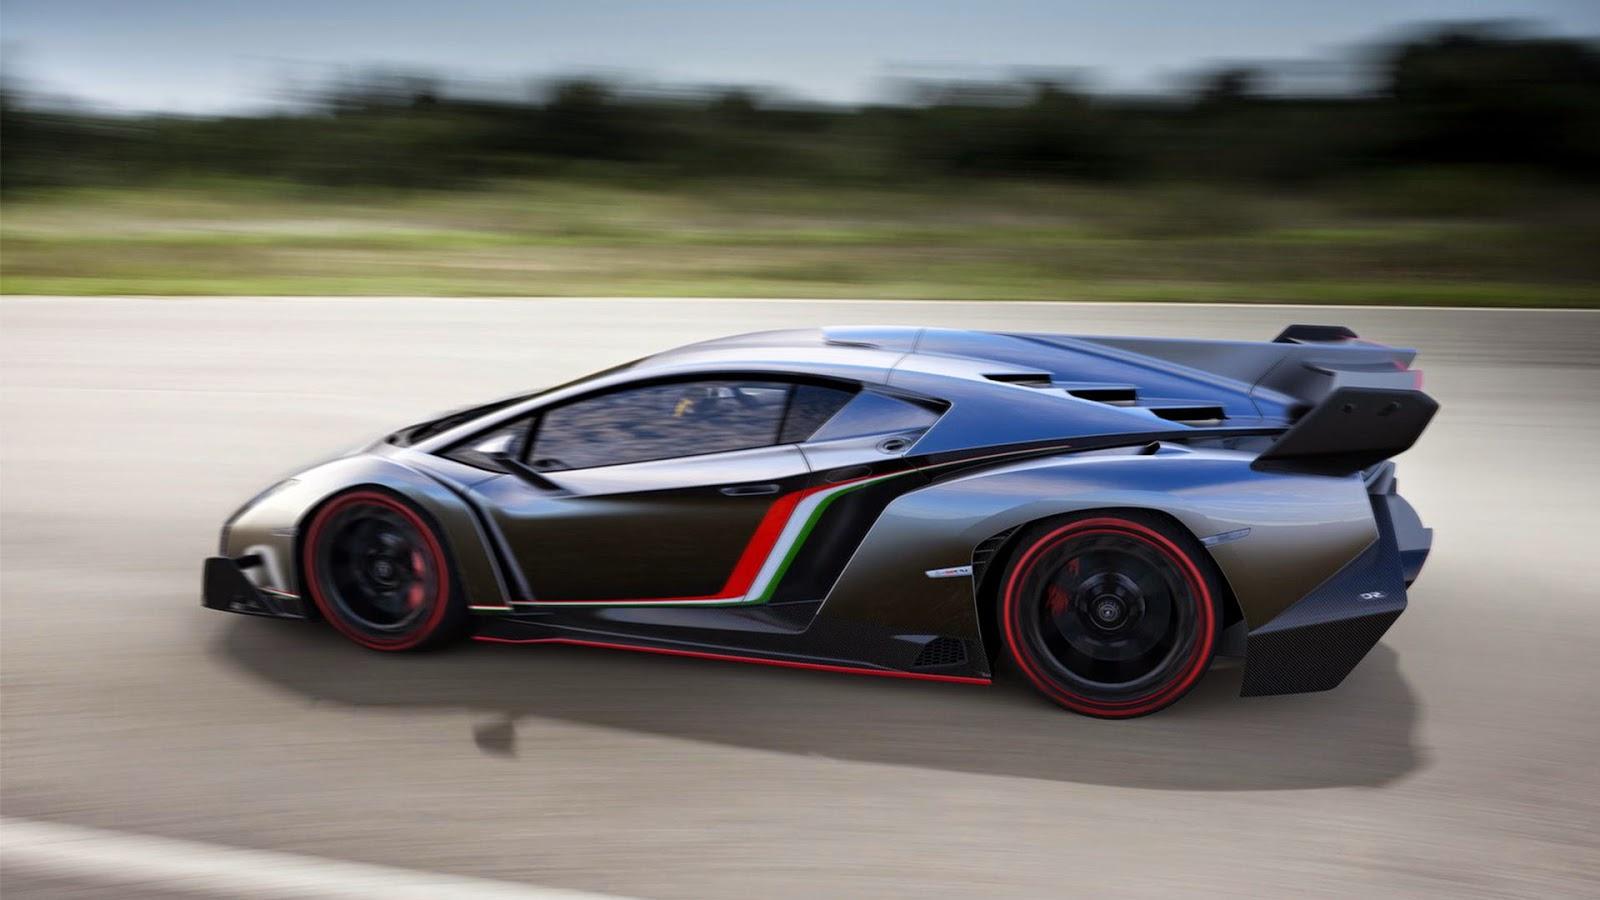 Lamborghini Sesto Elemento Wallpaper Hd Lamborghini Veneno Running In High Speed Lamborghini